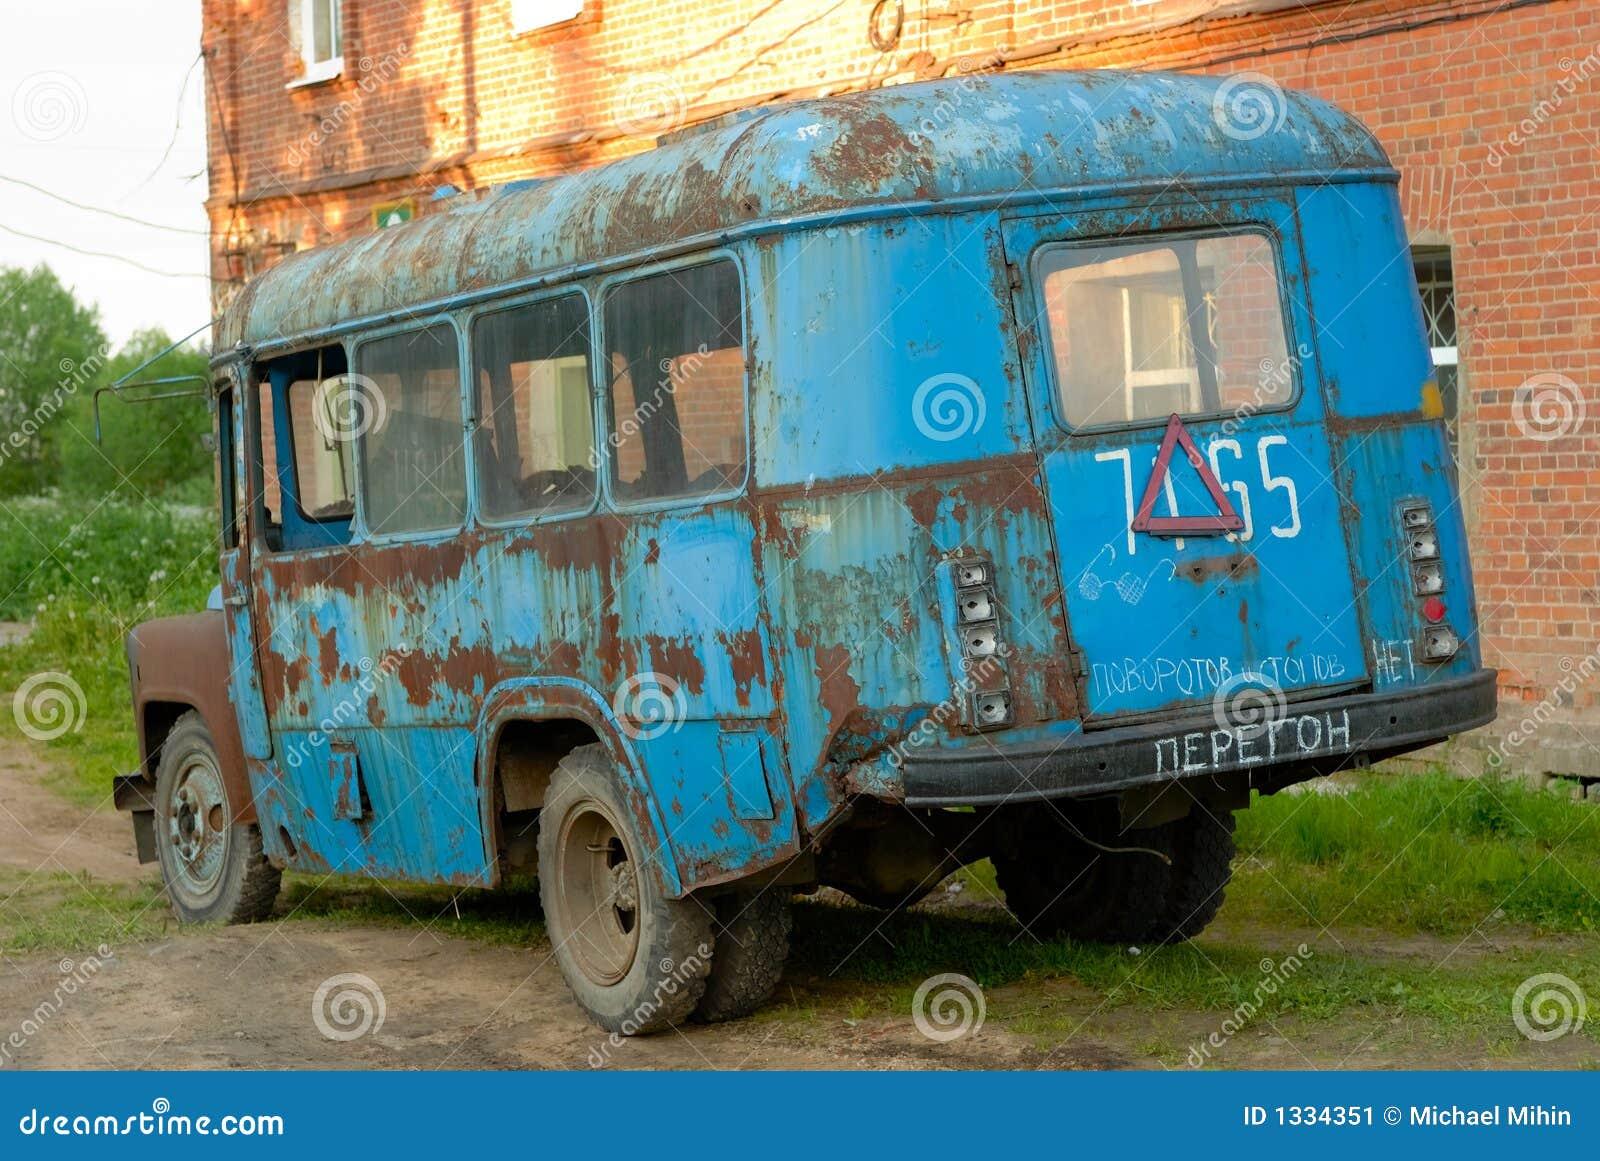 old broken bus stock image